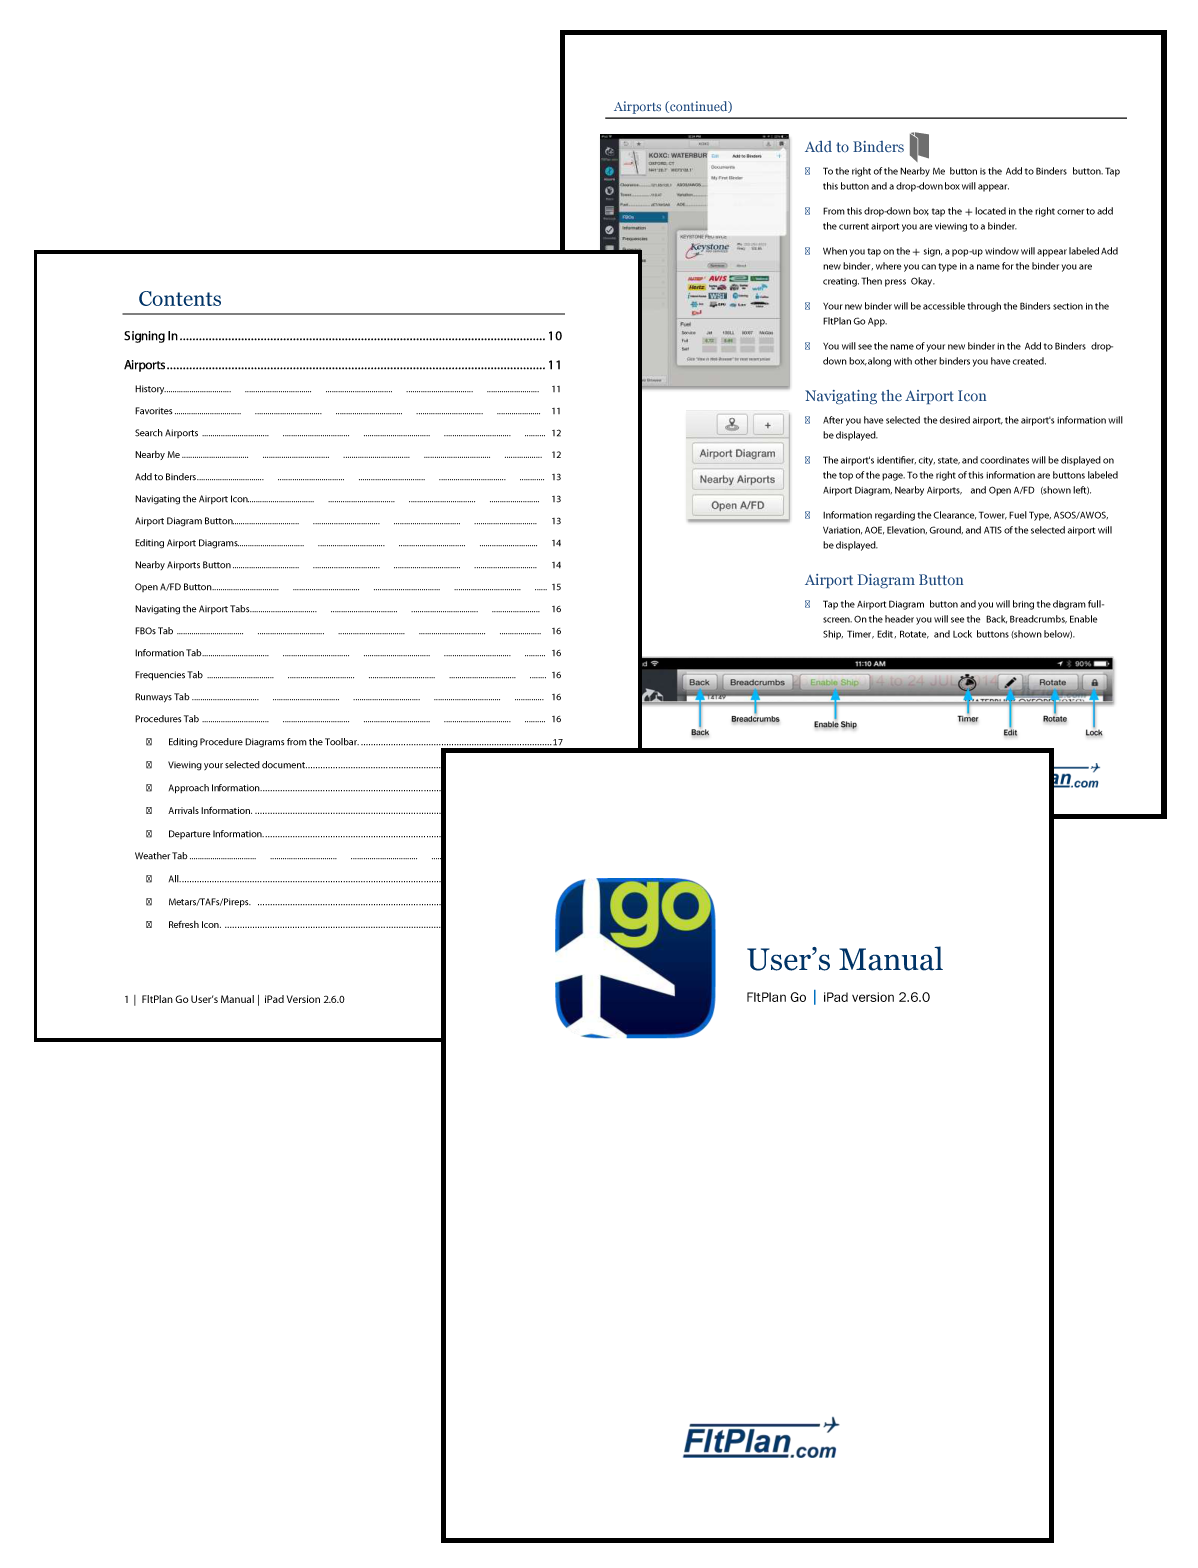 FltPlan User's Manual